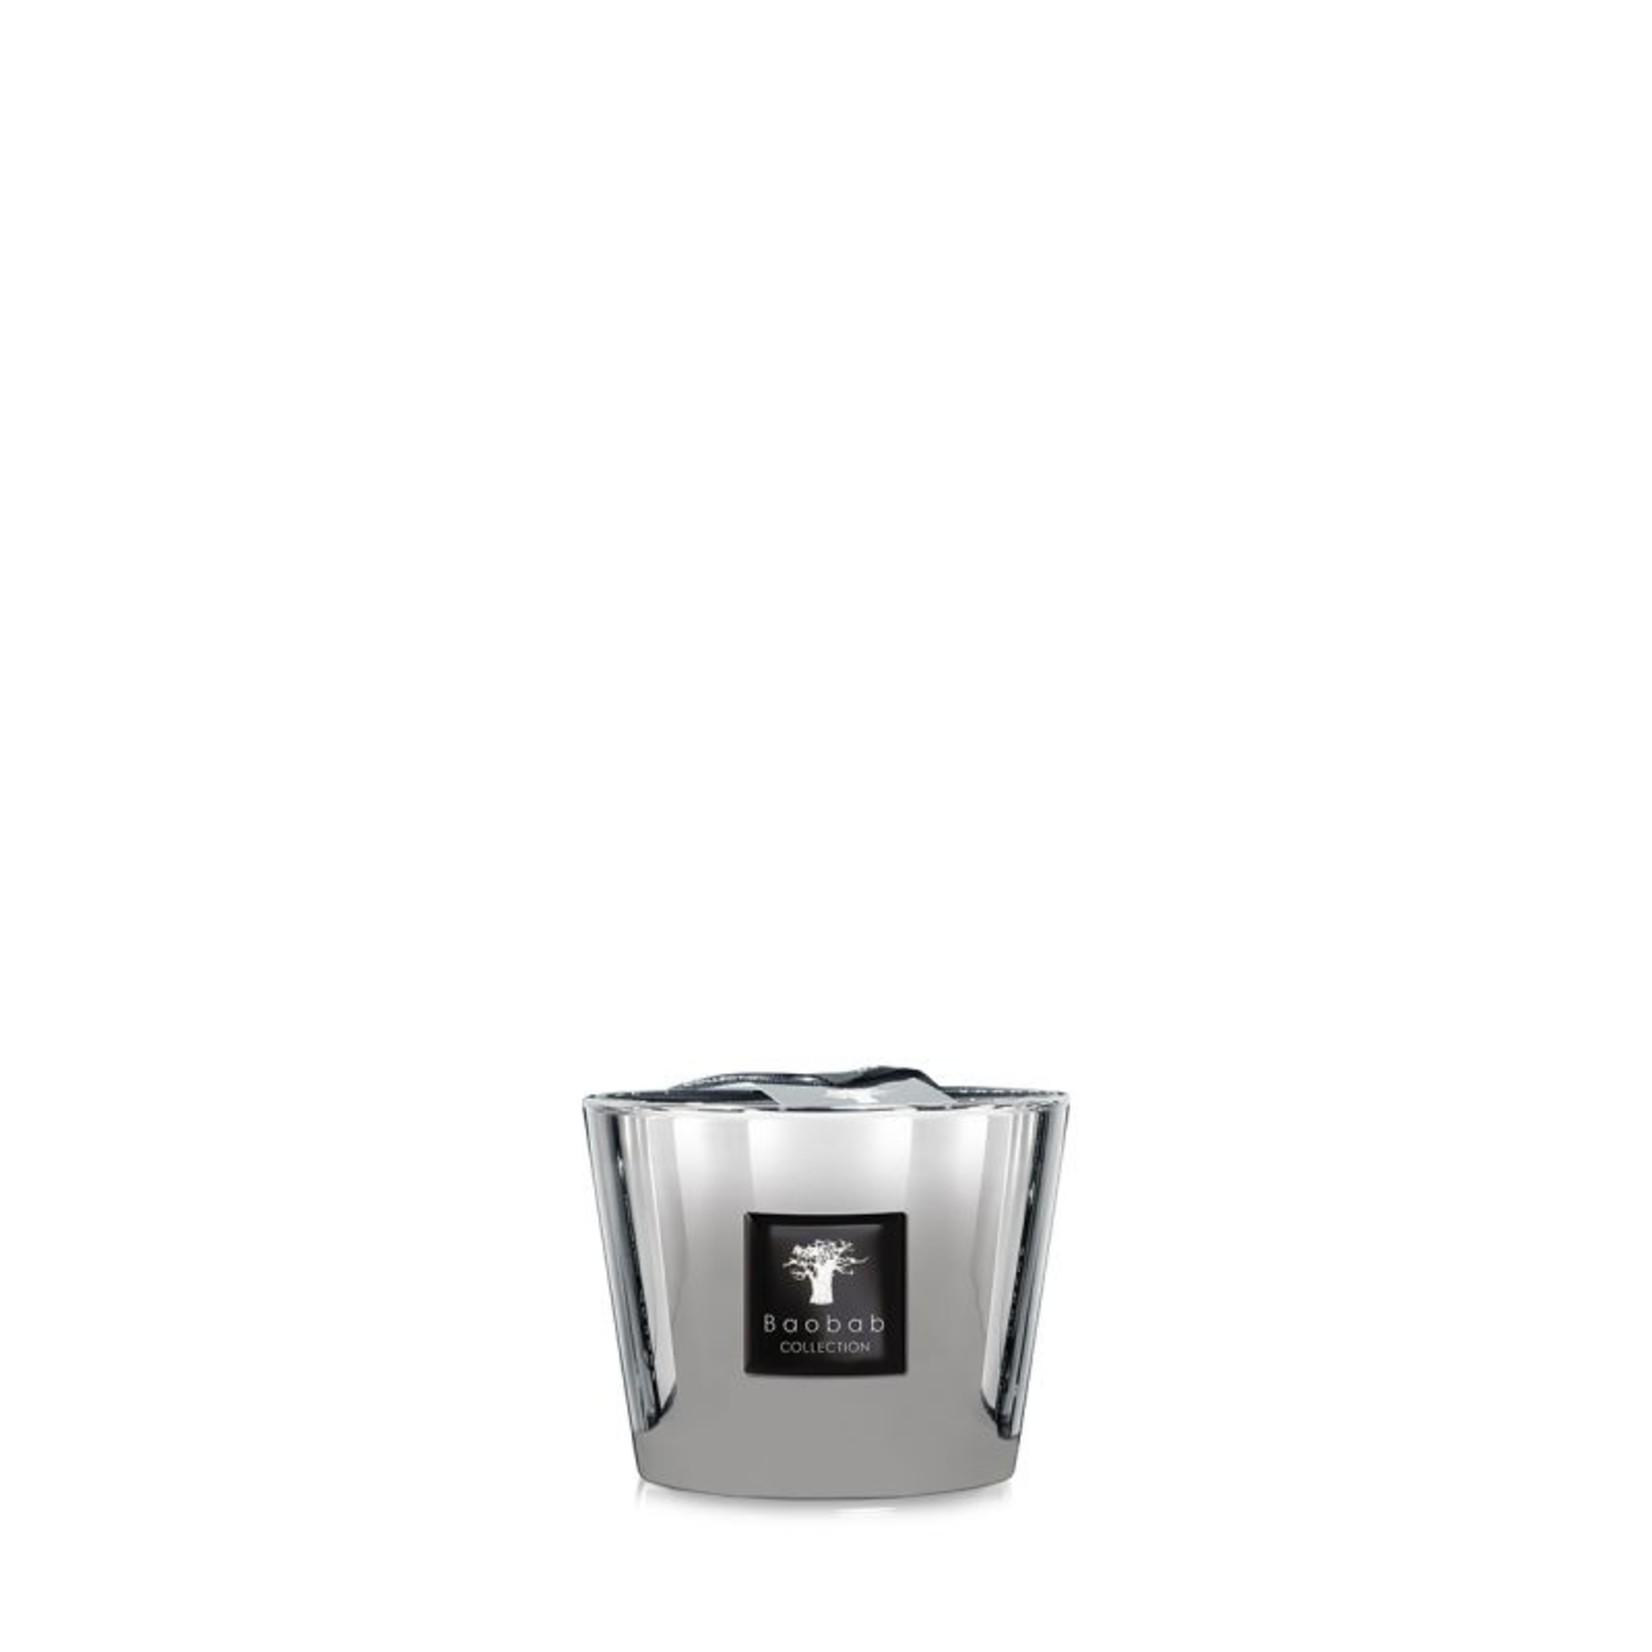 Baobab Collection Les Exclusives - Platinum | Max 10